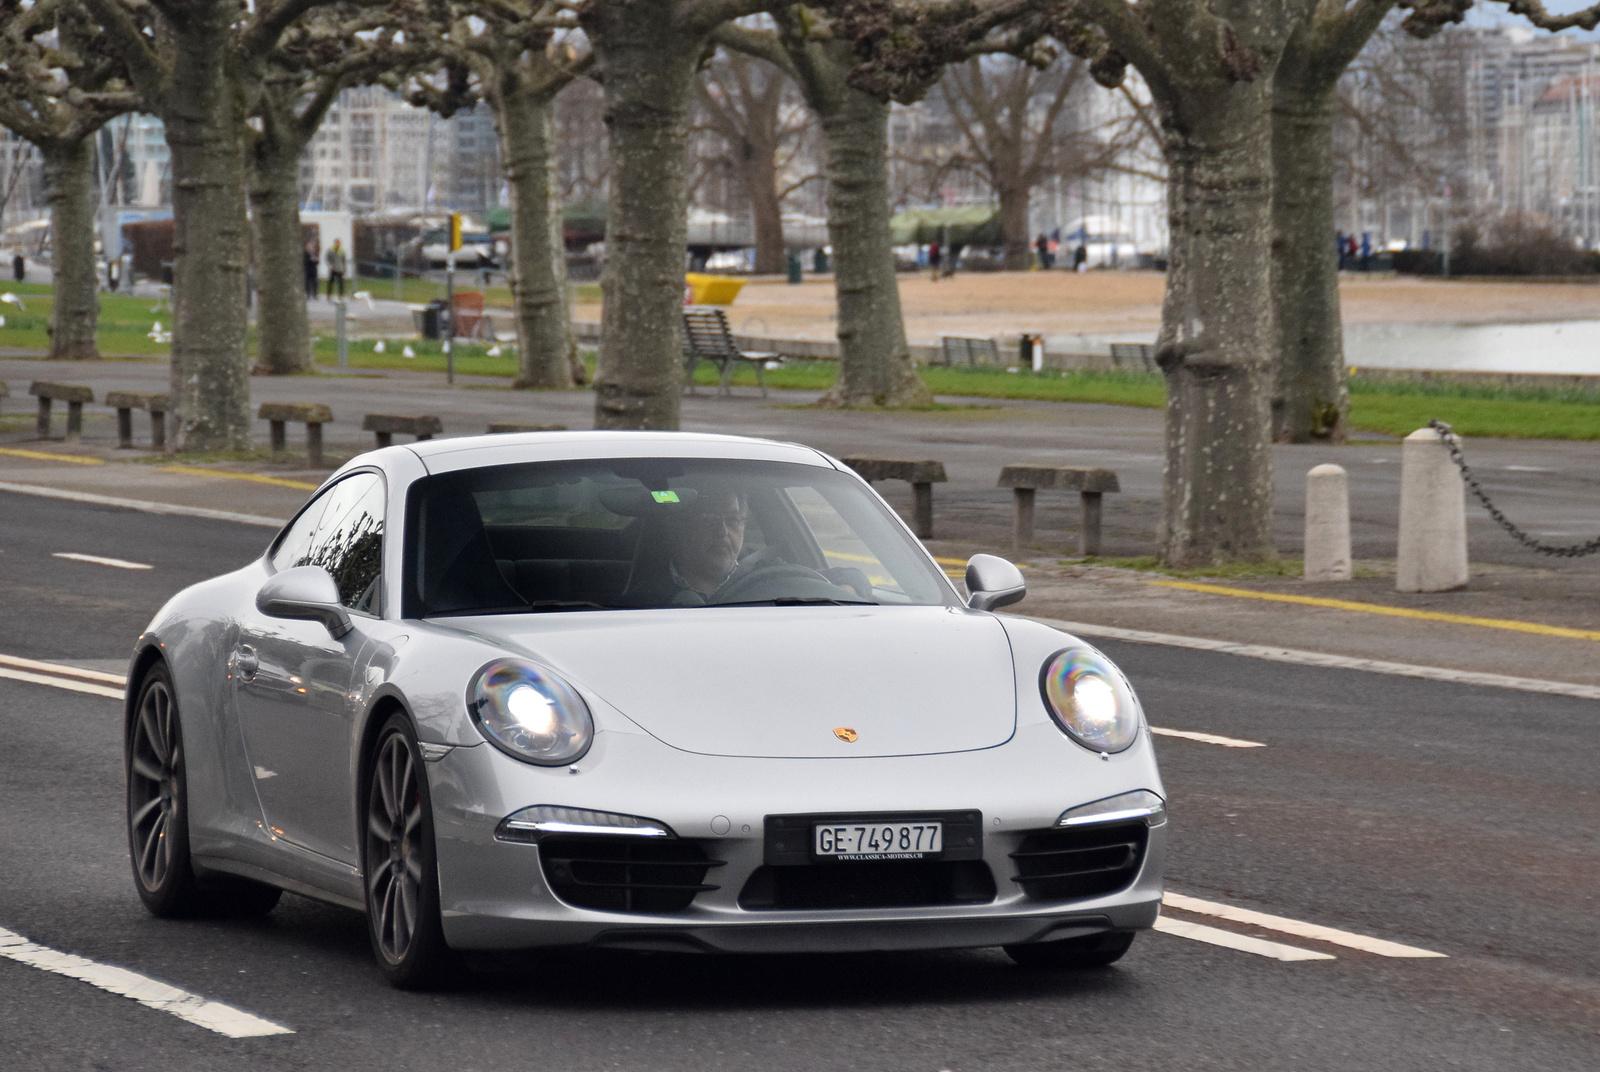 Porsche 911 Carrera 4S (991)